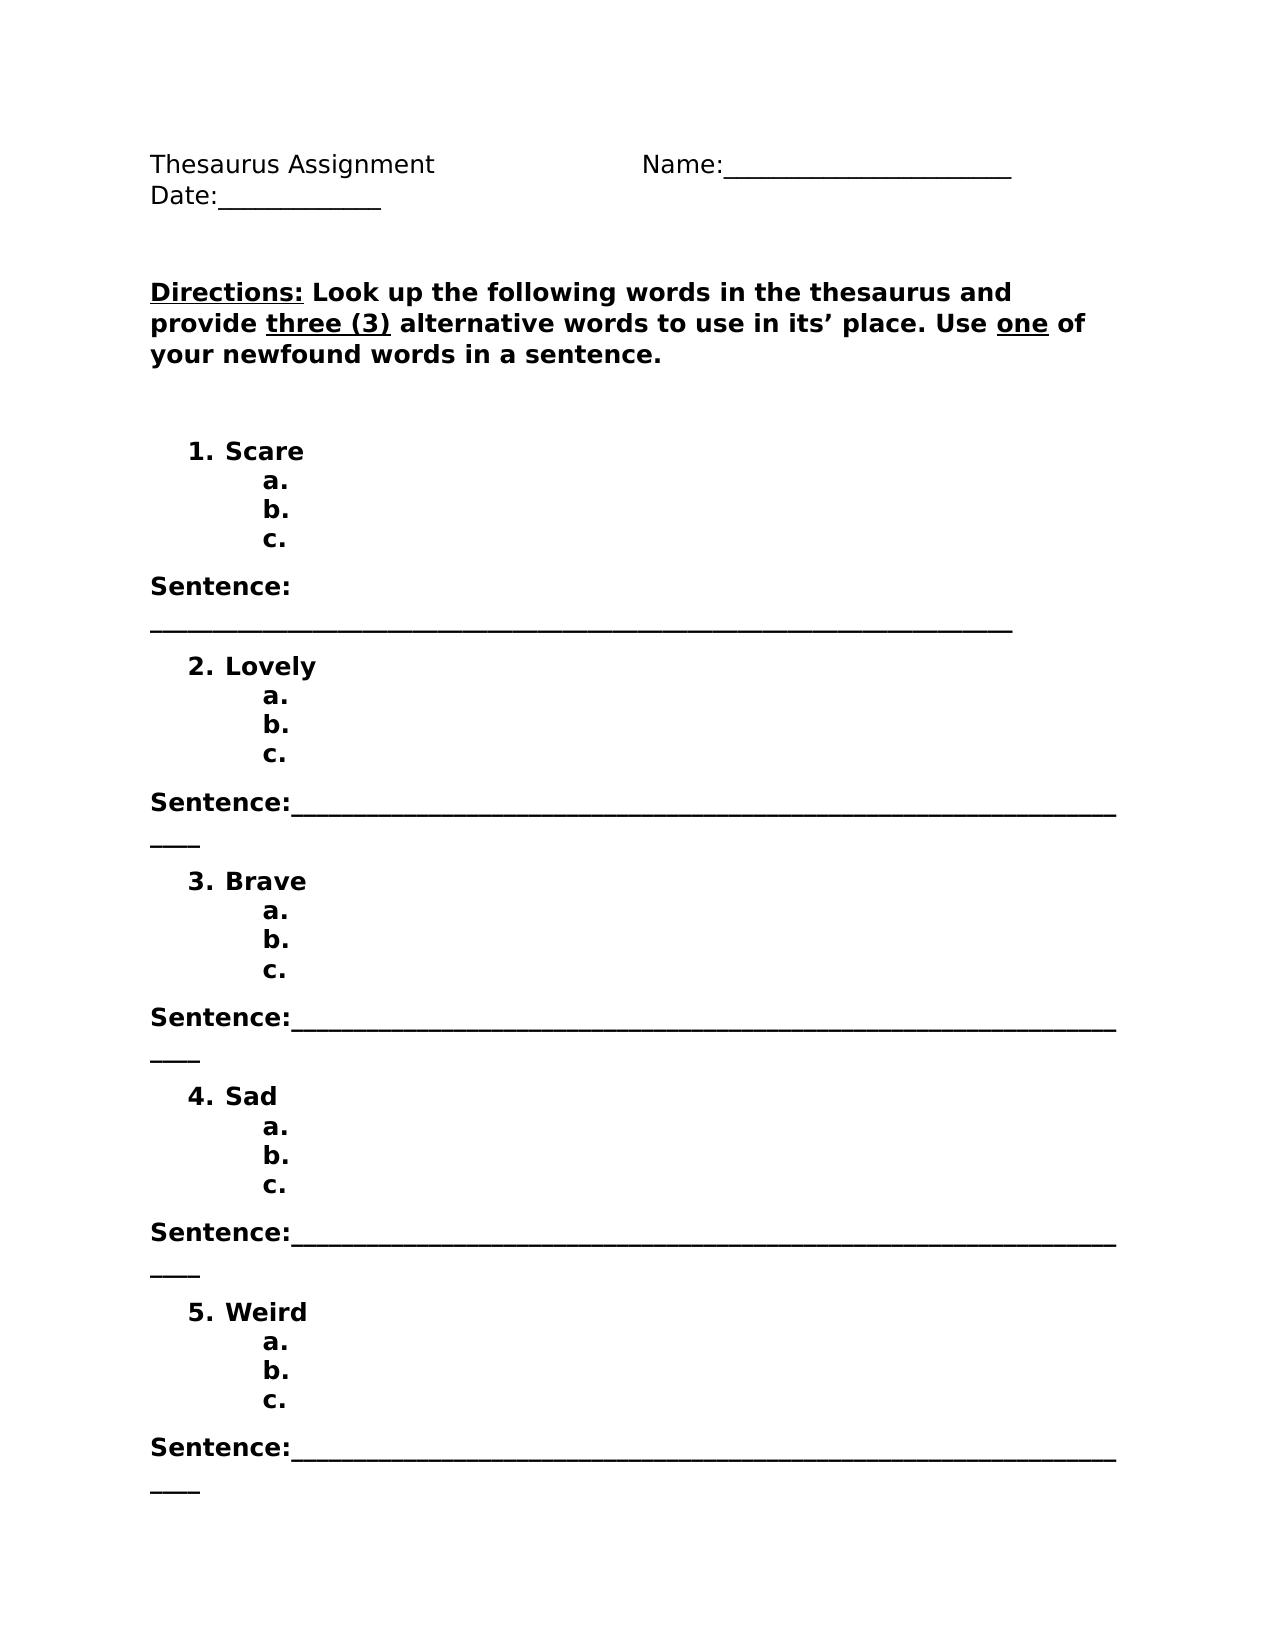 Thesaurus Assignment By Missbratt Ninja Plans